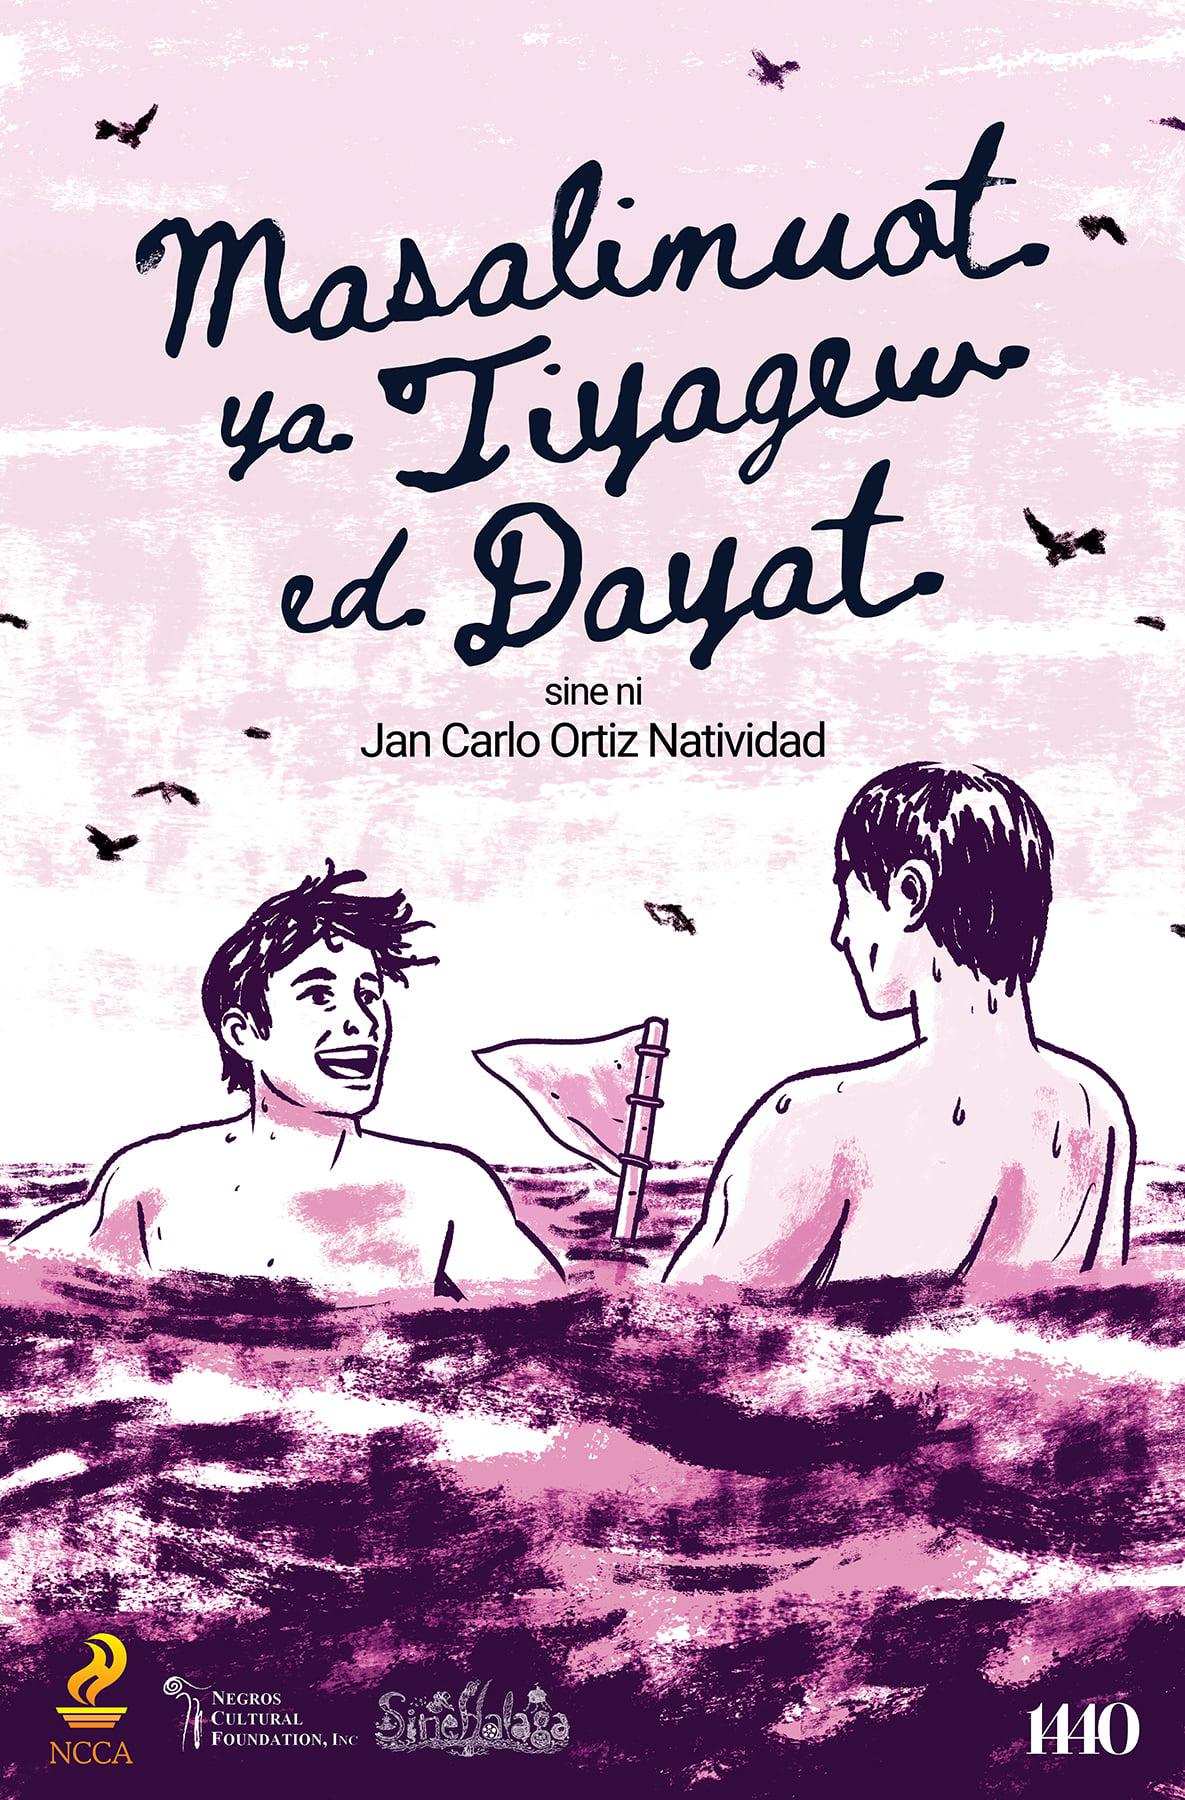 Masalimuut Ya Tiyagew Ed Dayat